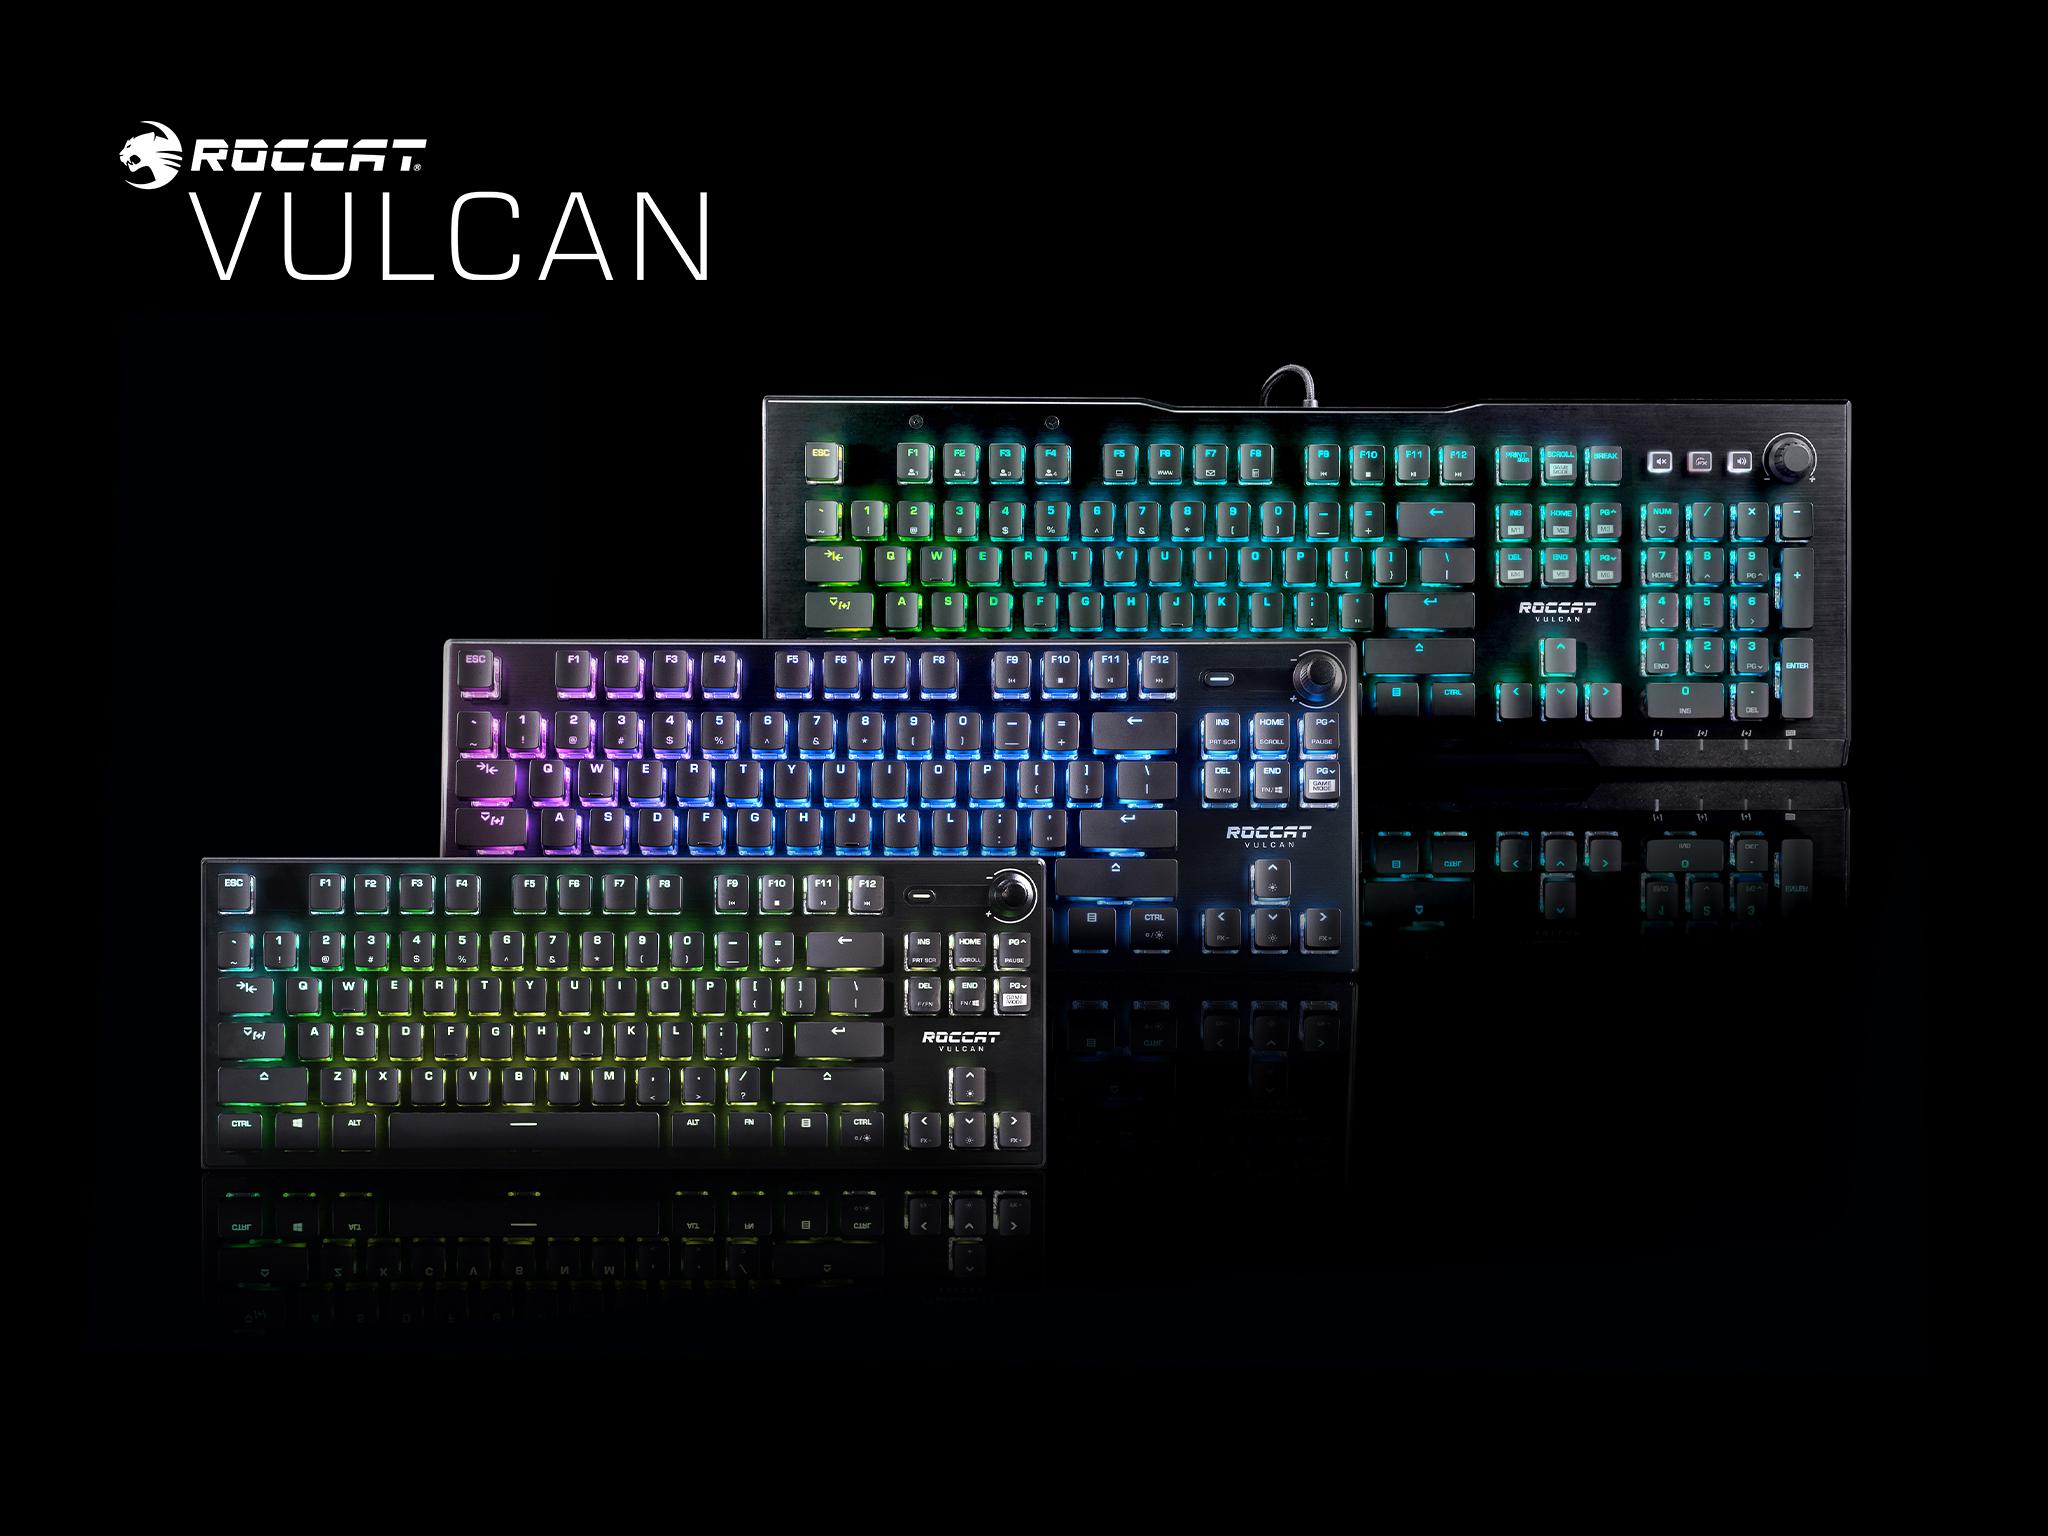 Vulcan Series